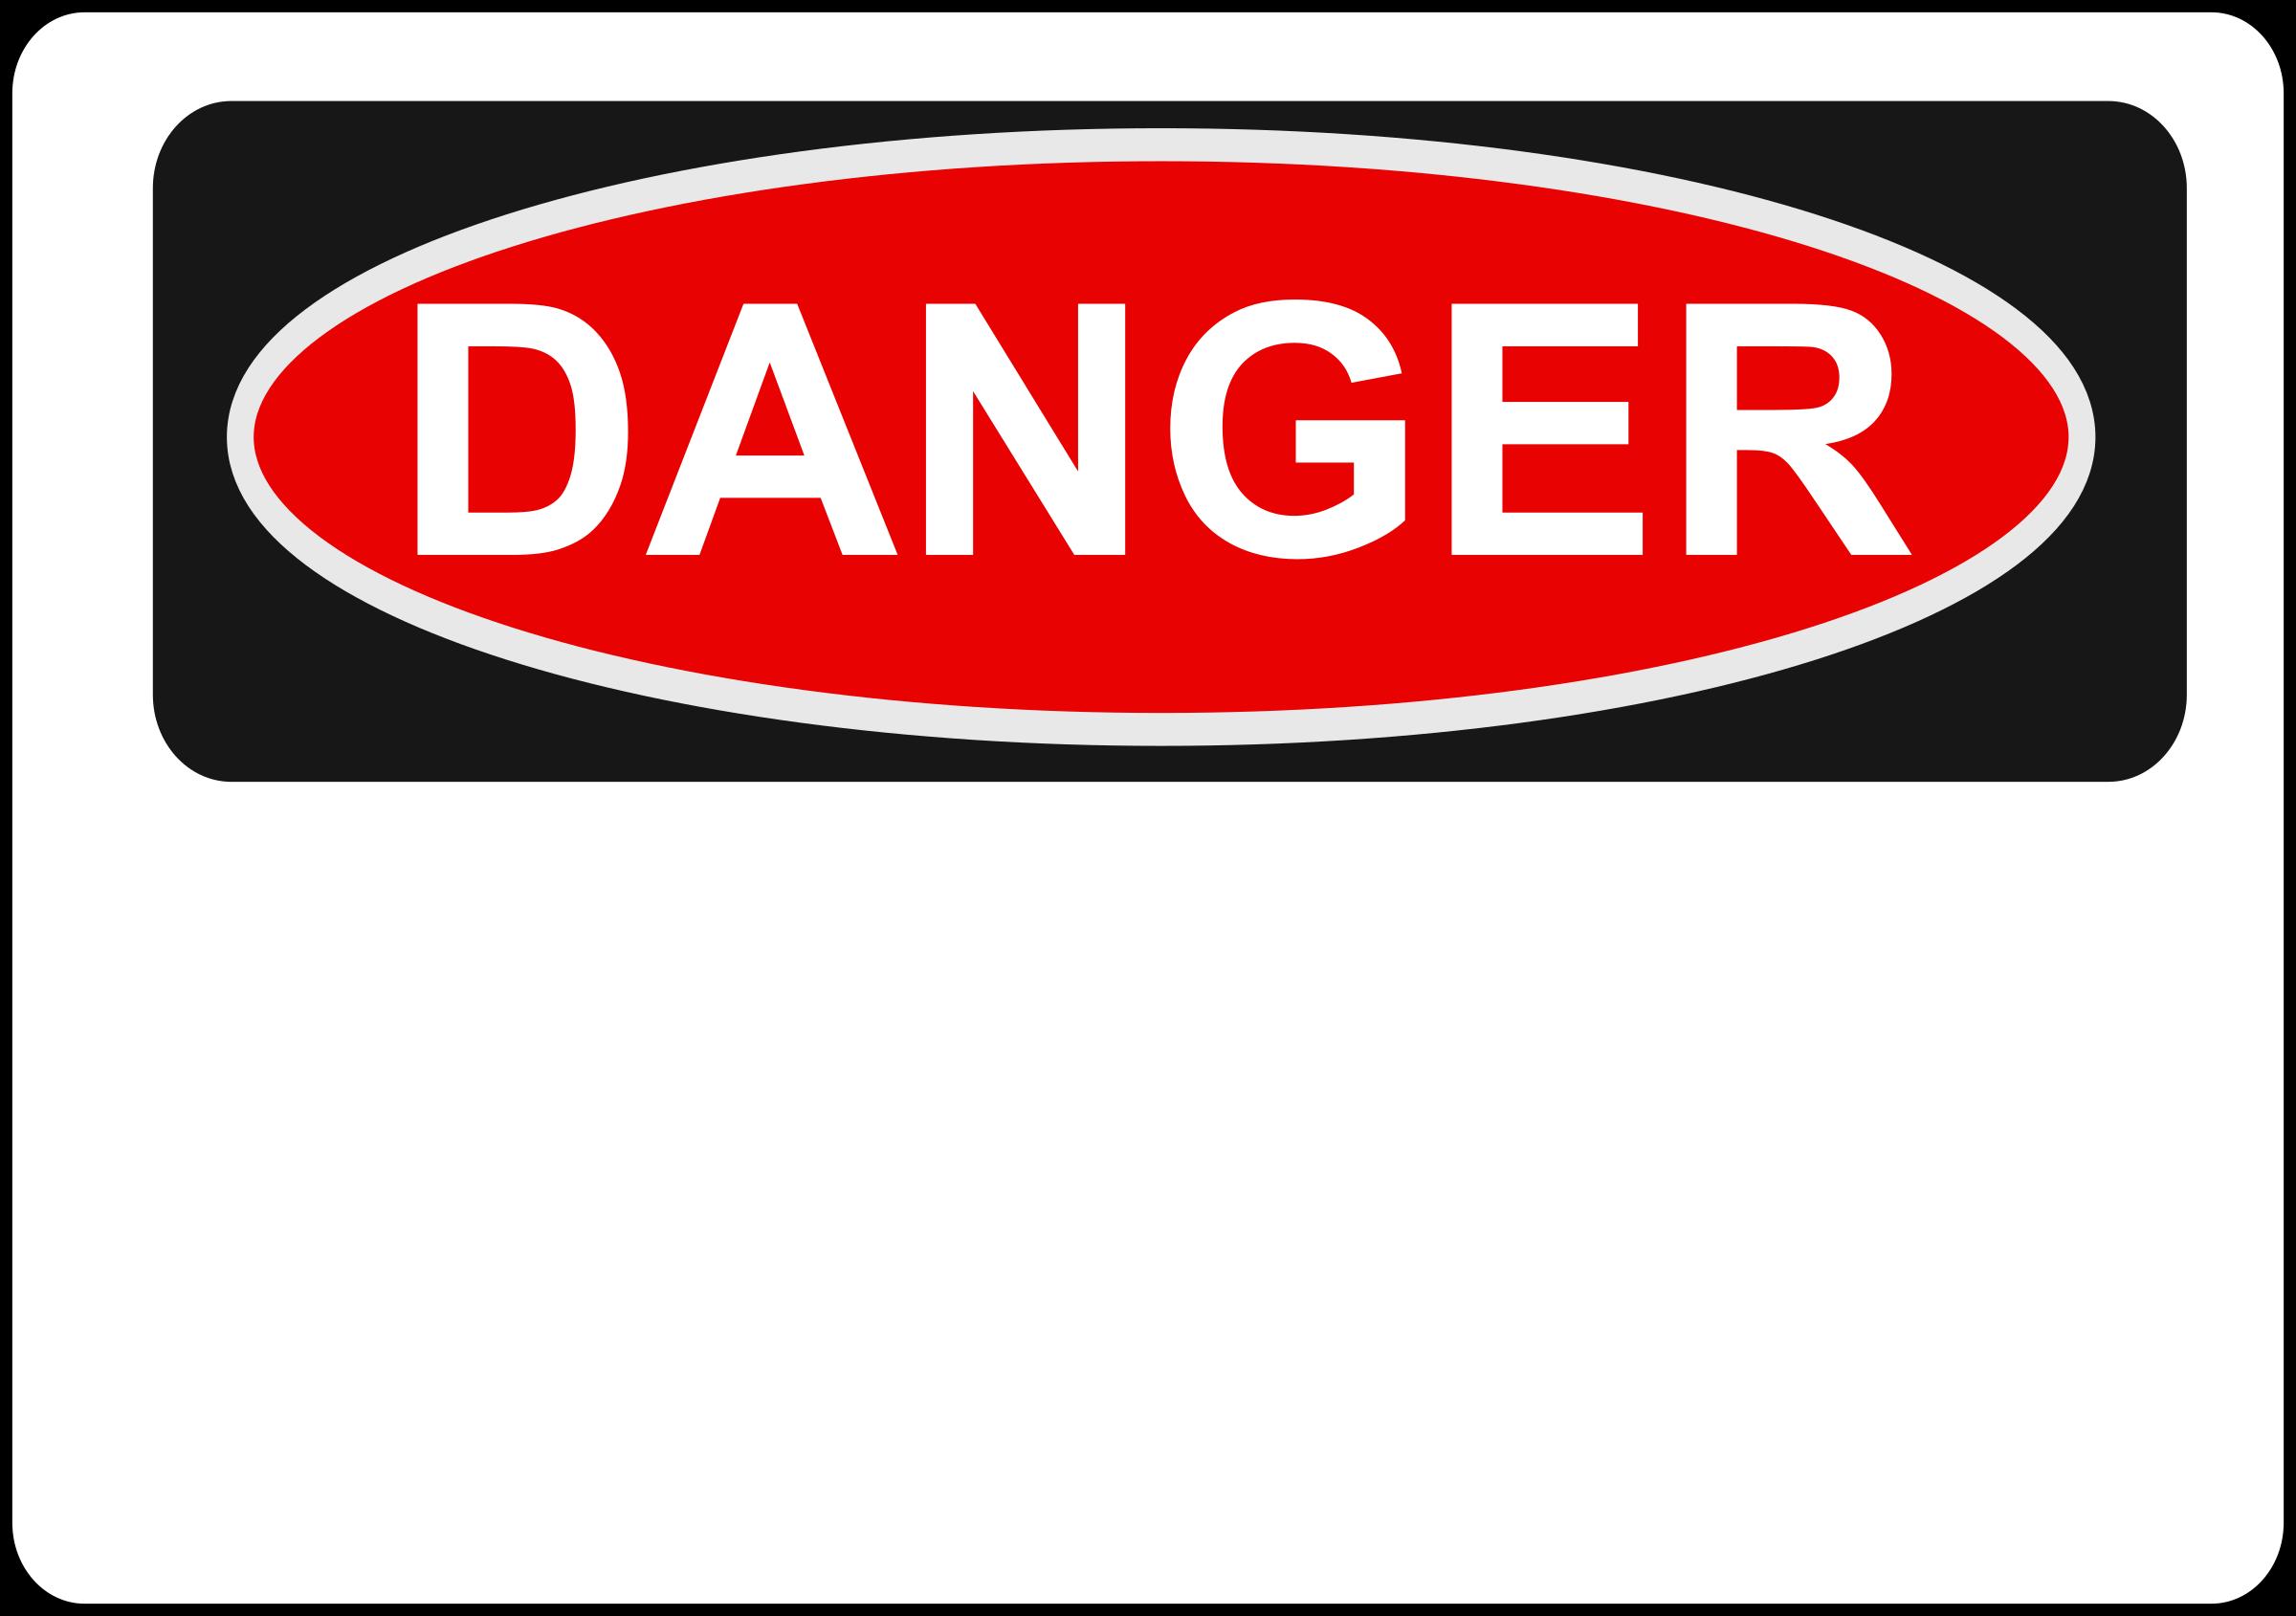 Danger clipart. Blank big image png